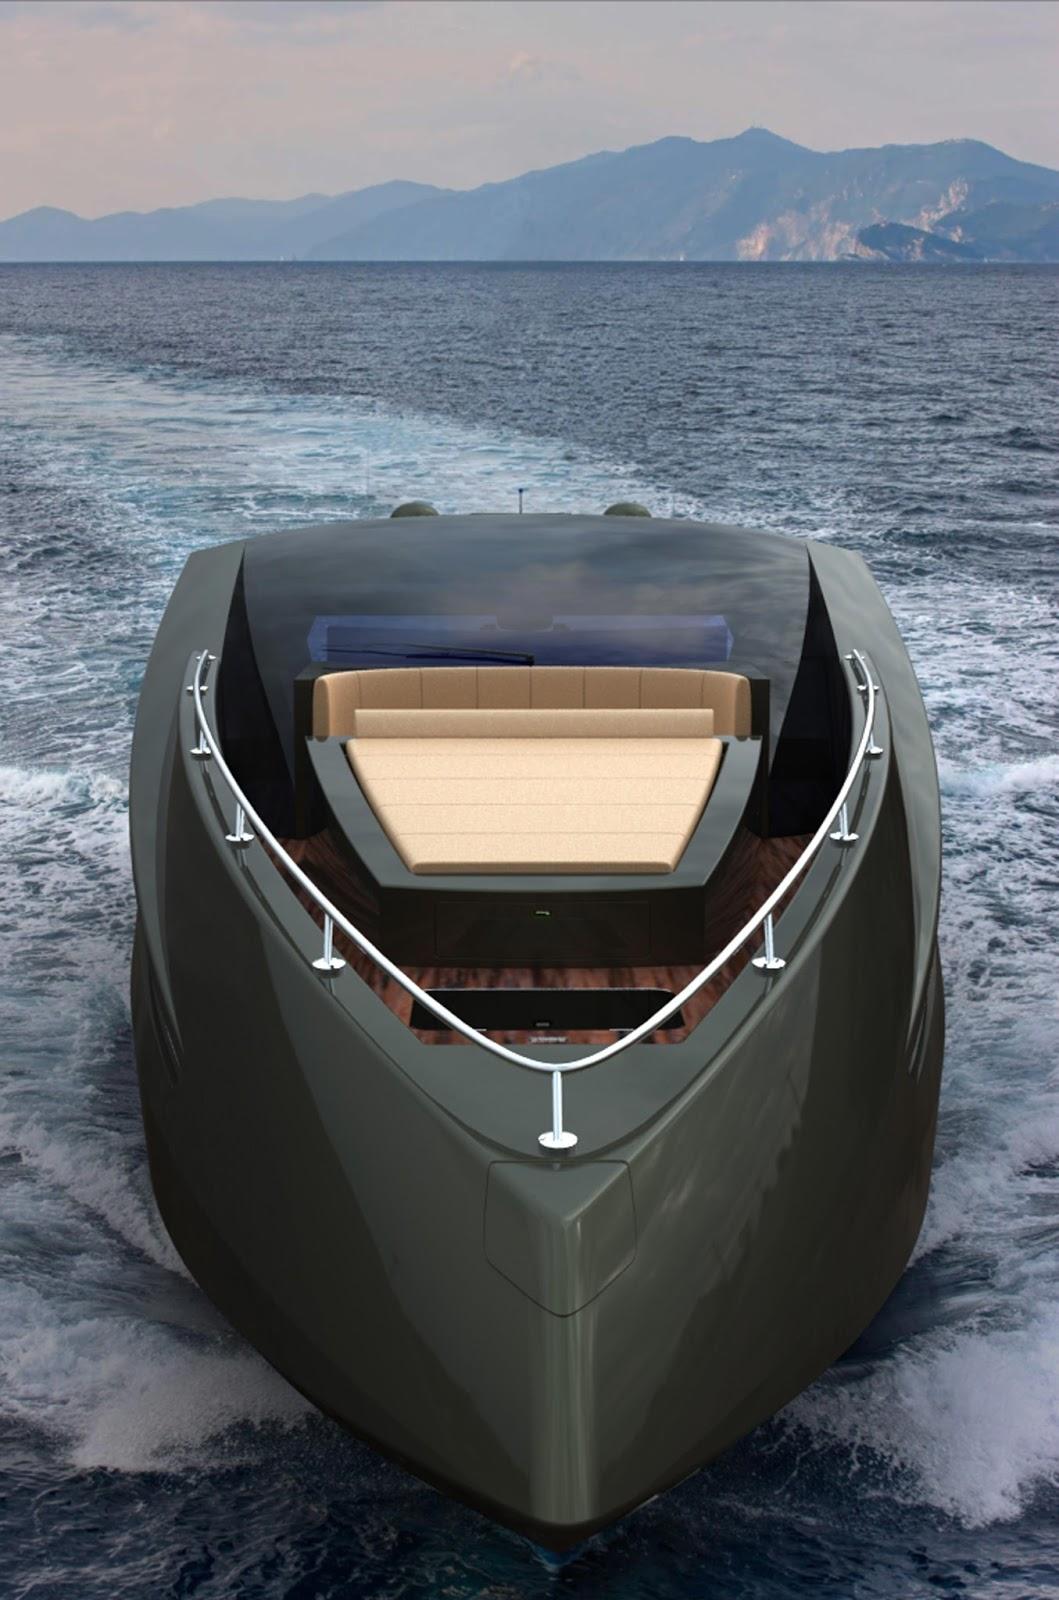 Mauro Lecchi S Lamborghini Yacht